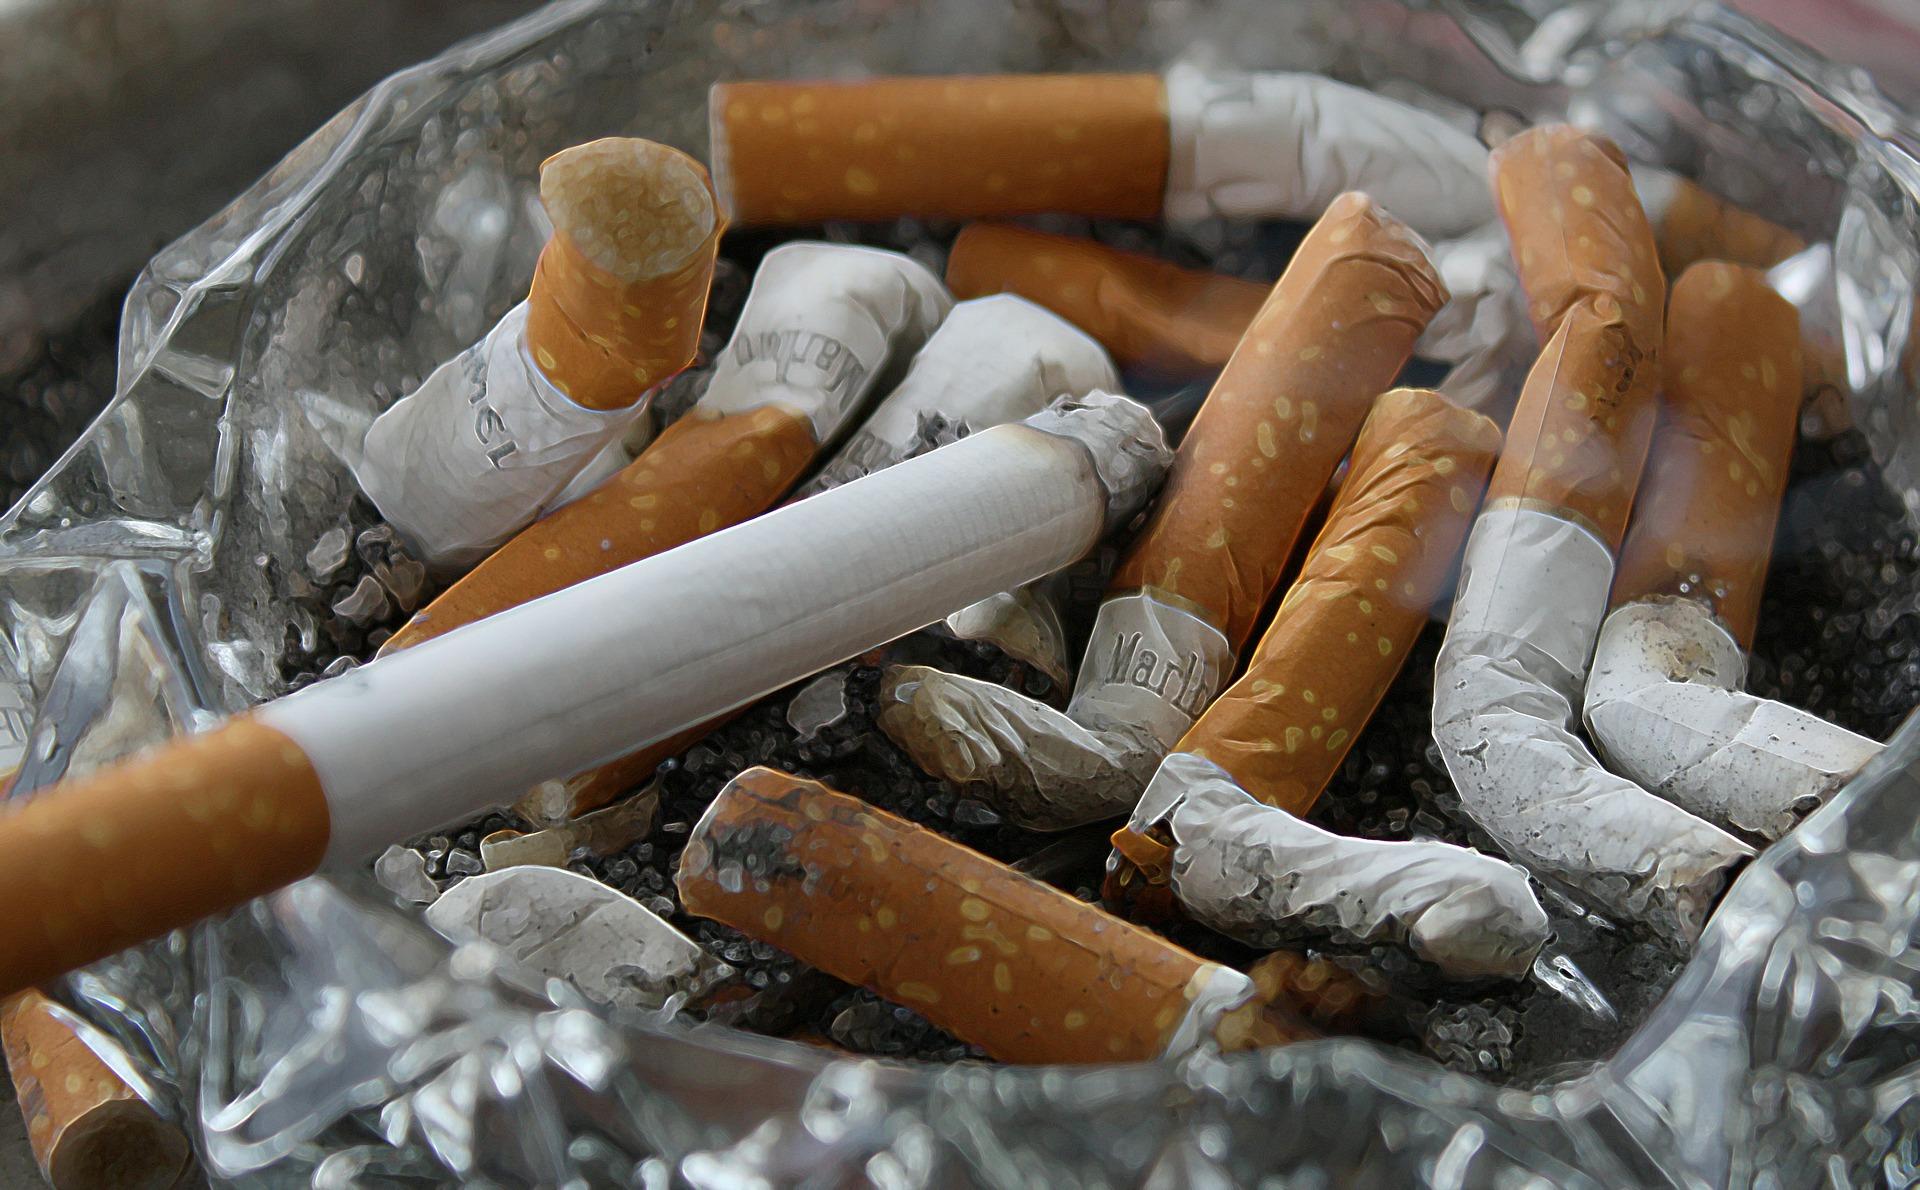 cigarettes-83571_1920.jpg